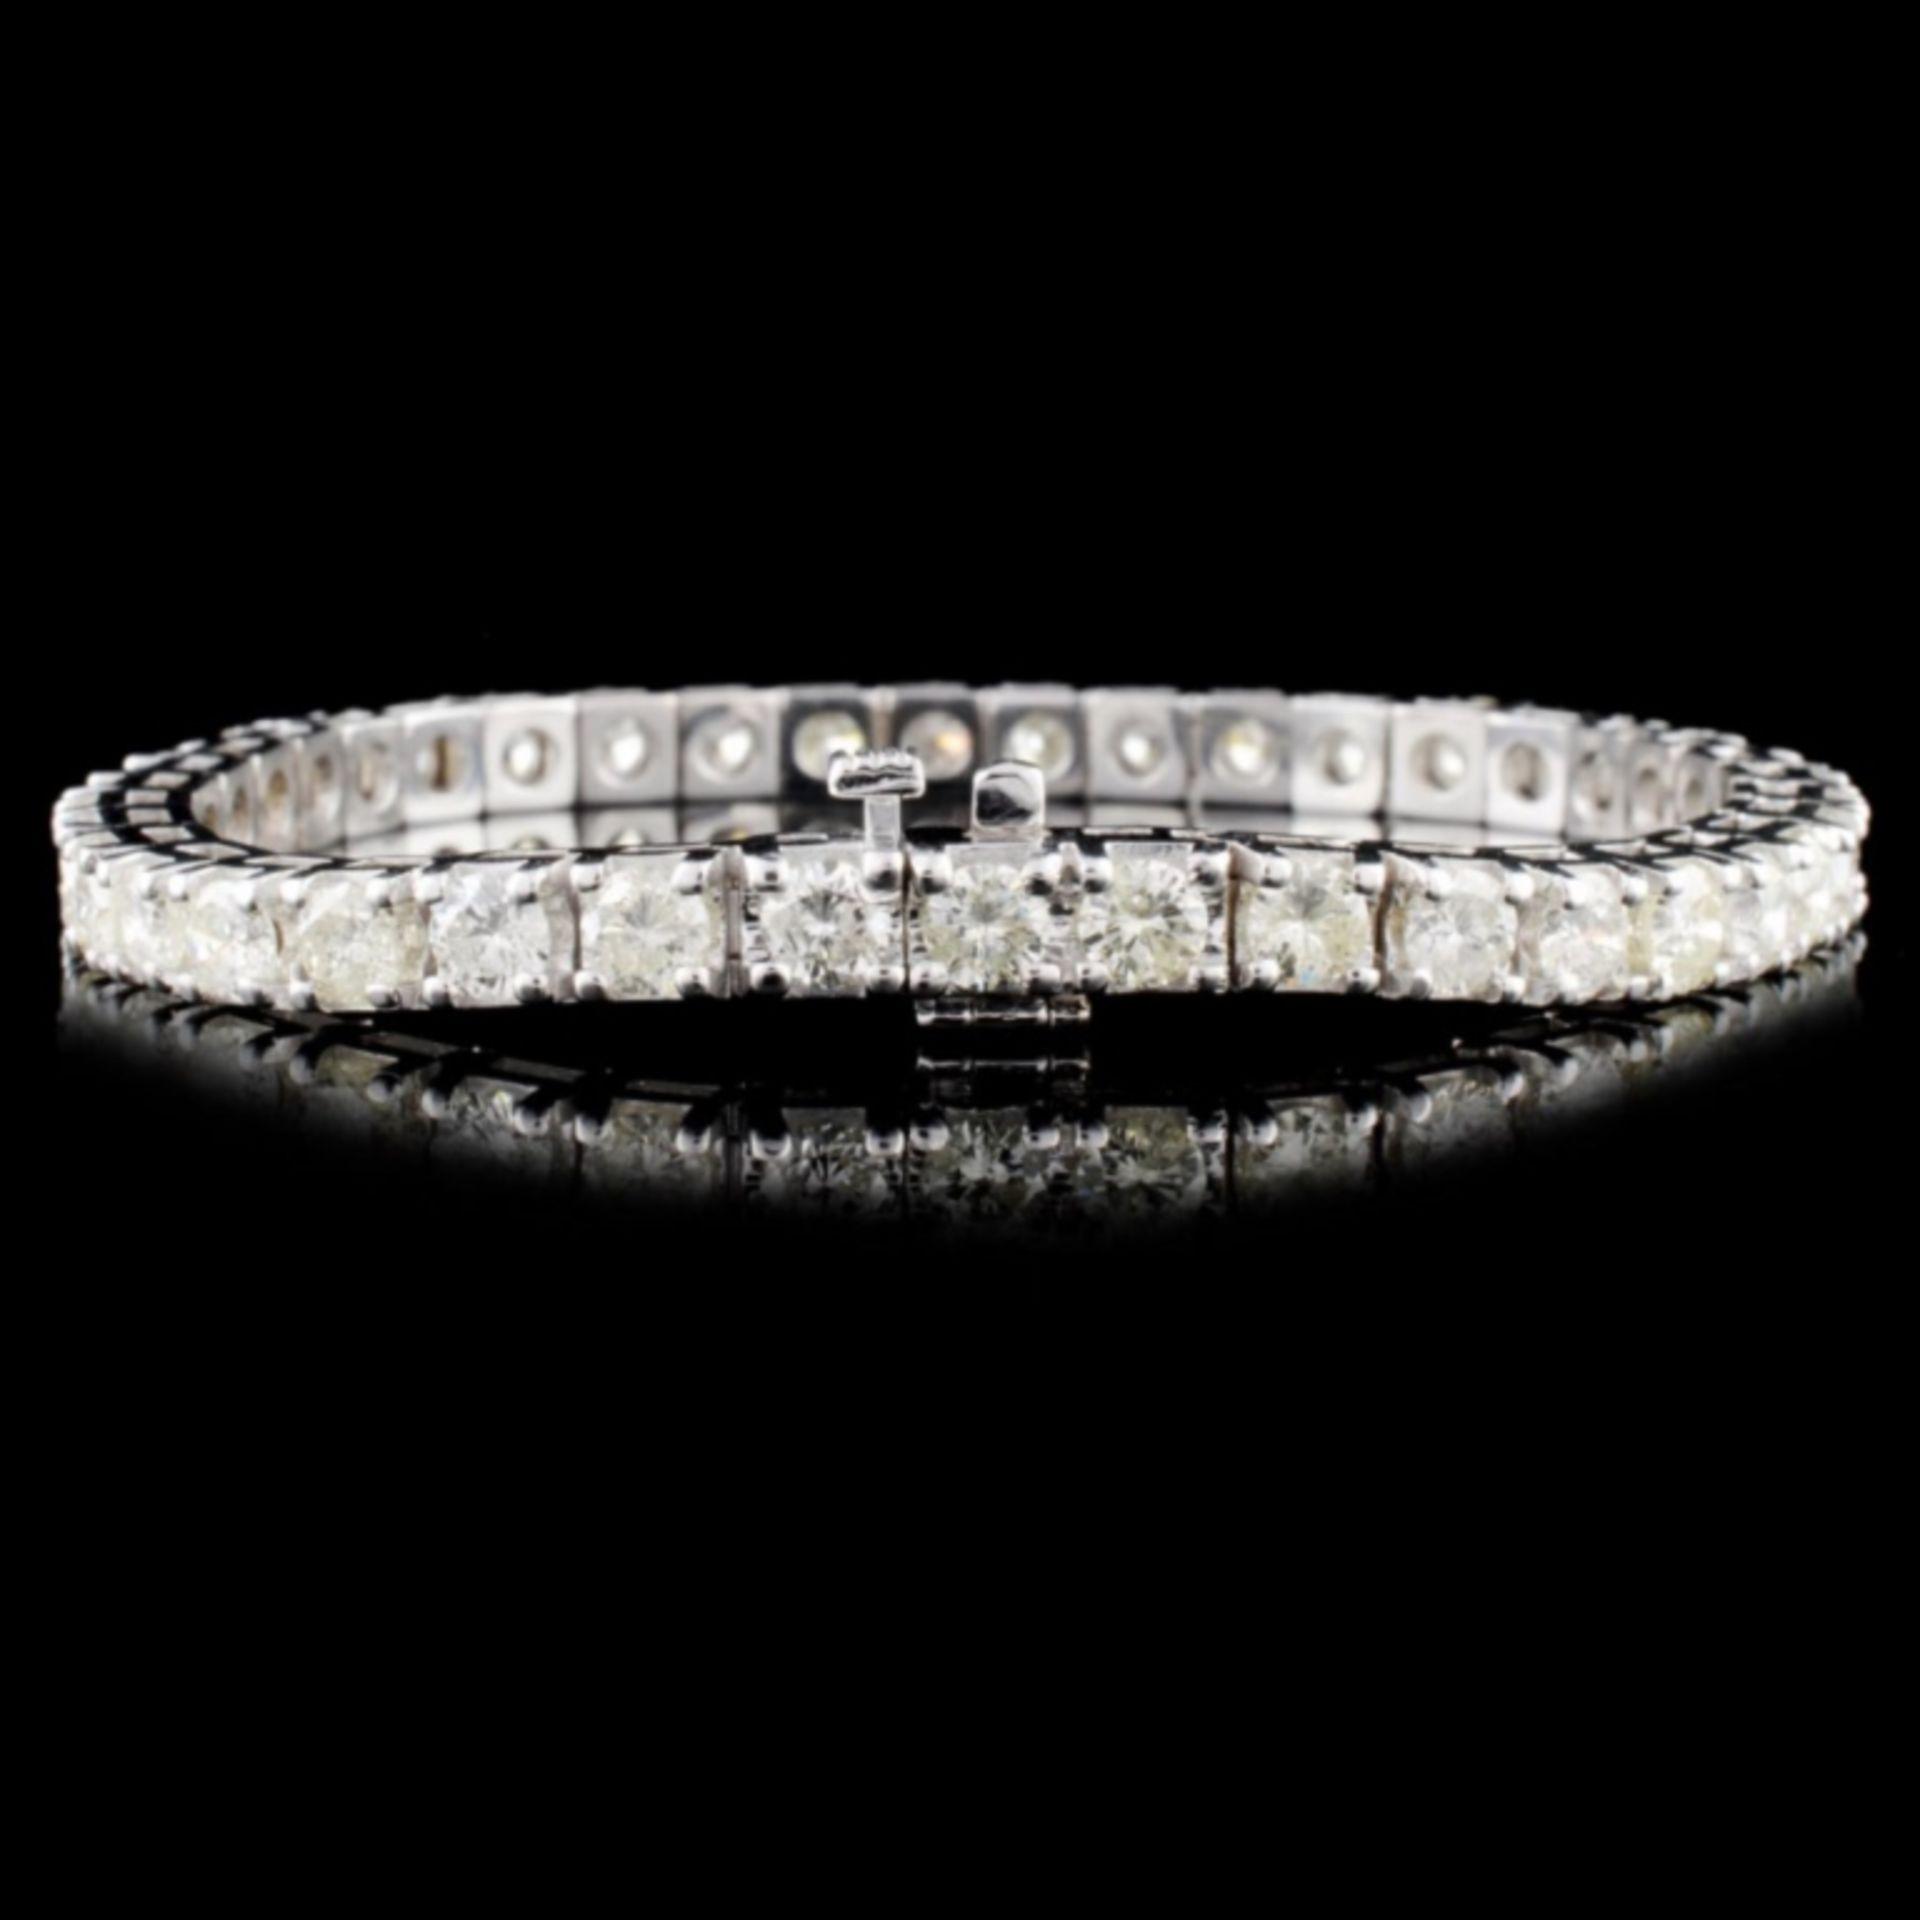 14K Gold 10.00ctw Diamond Bracelet - Image 2 of 3